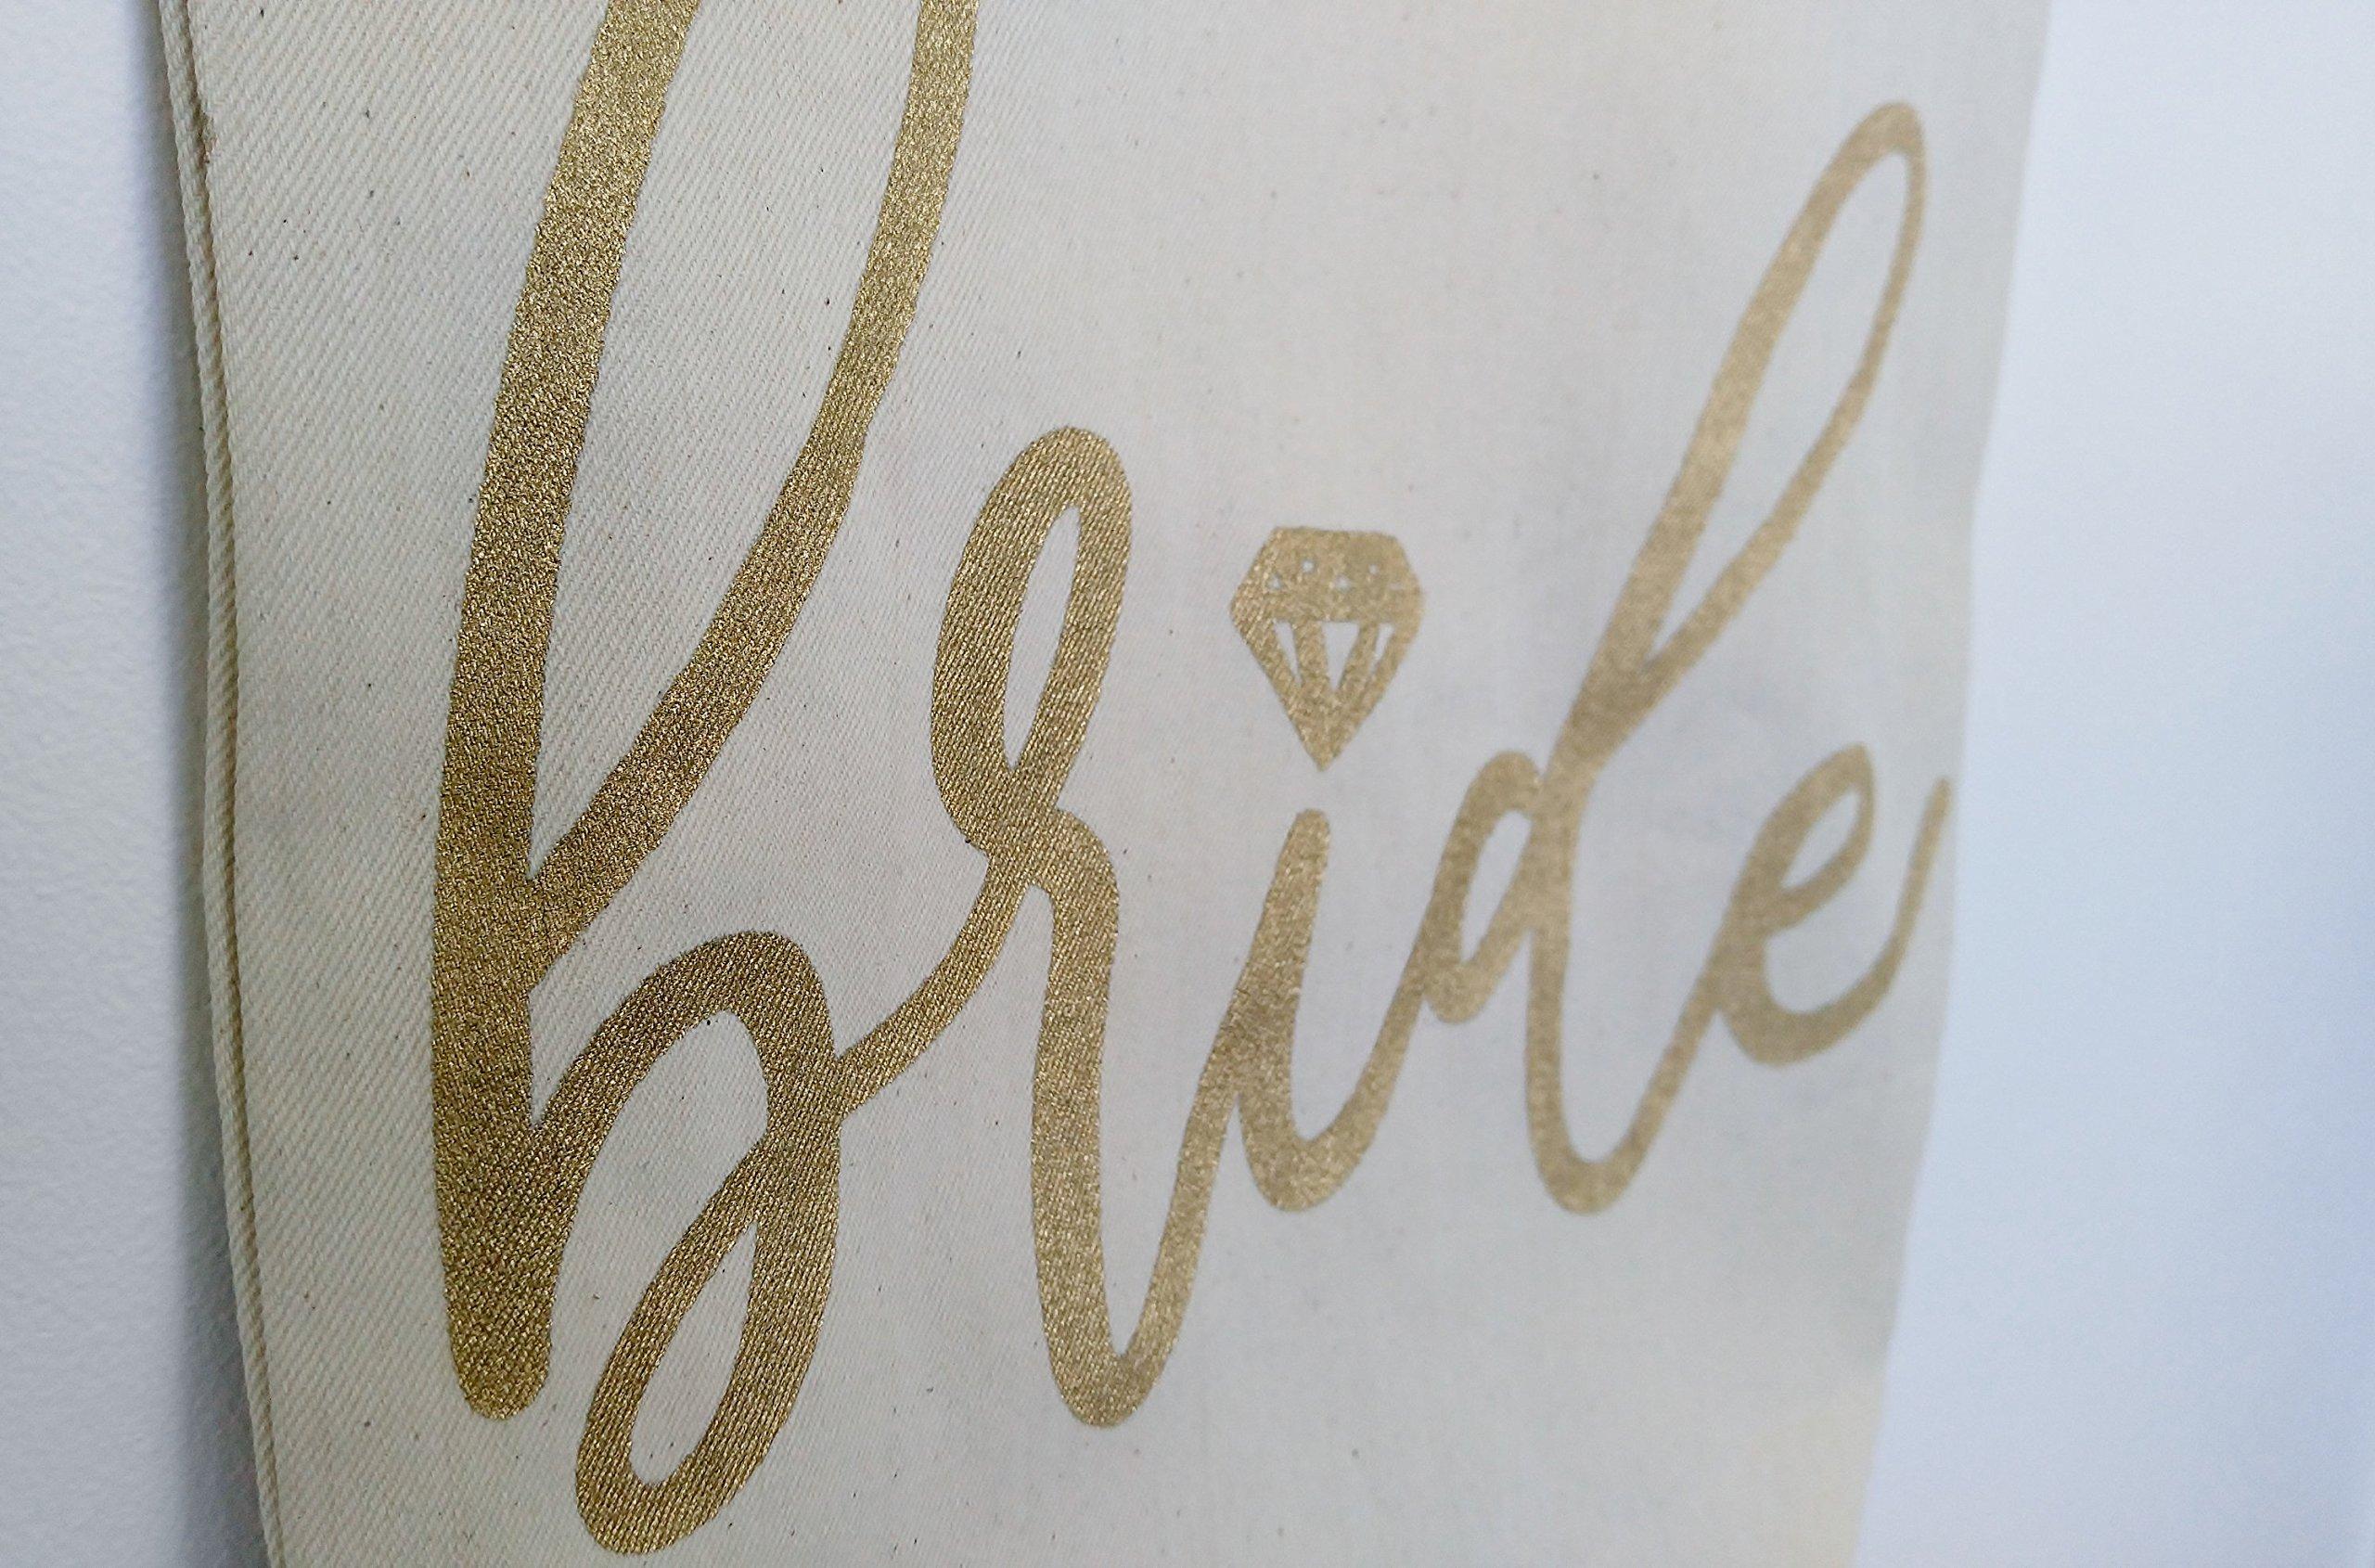 Bride Tote Bag, Honeymoon Bag, Bridal Tote, Bride Gift, Future Mrs Tote, Engagement Gift, Bridal Shower Gift, Bride Bag, Mrs Bag - handmade-bags